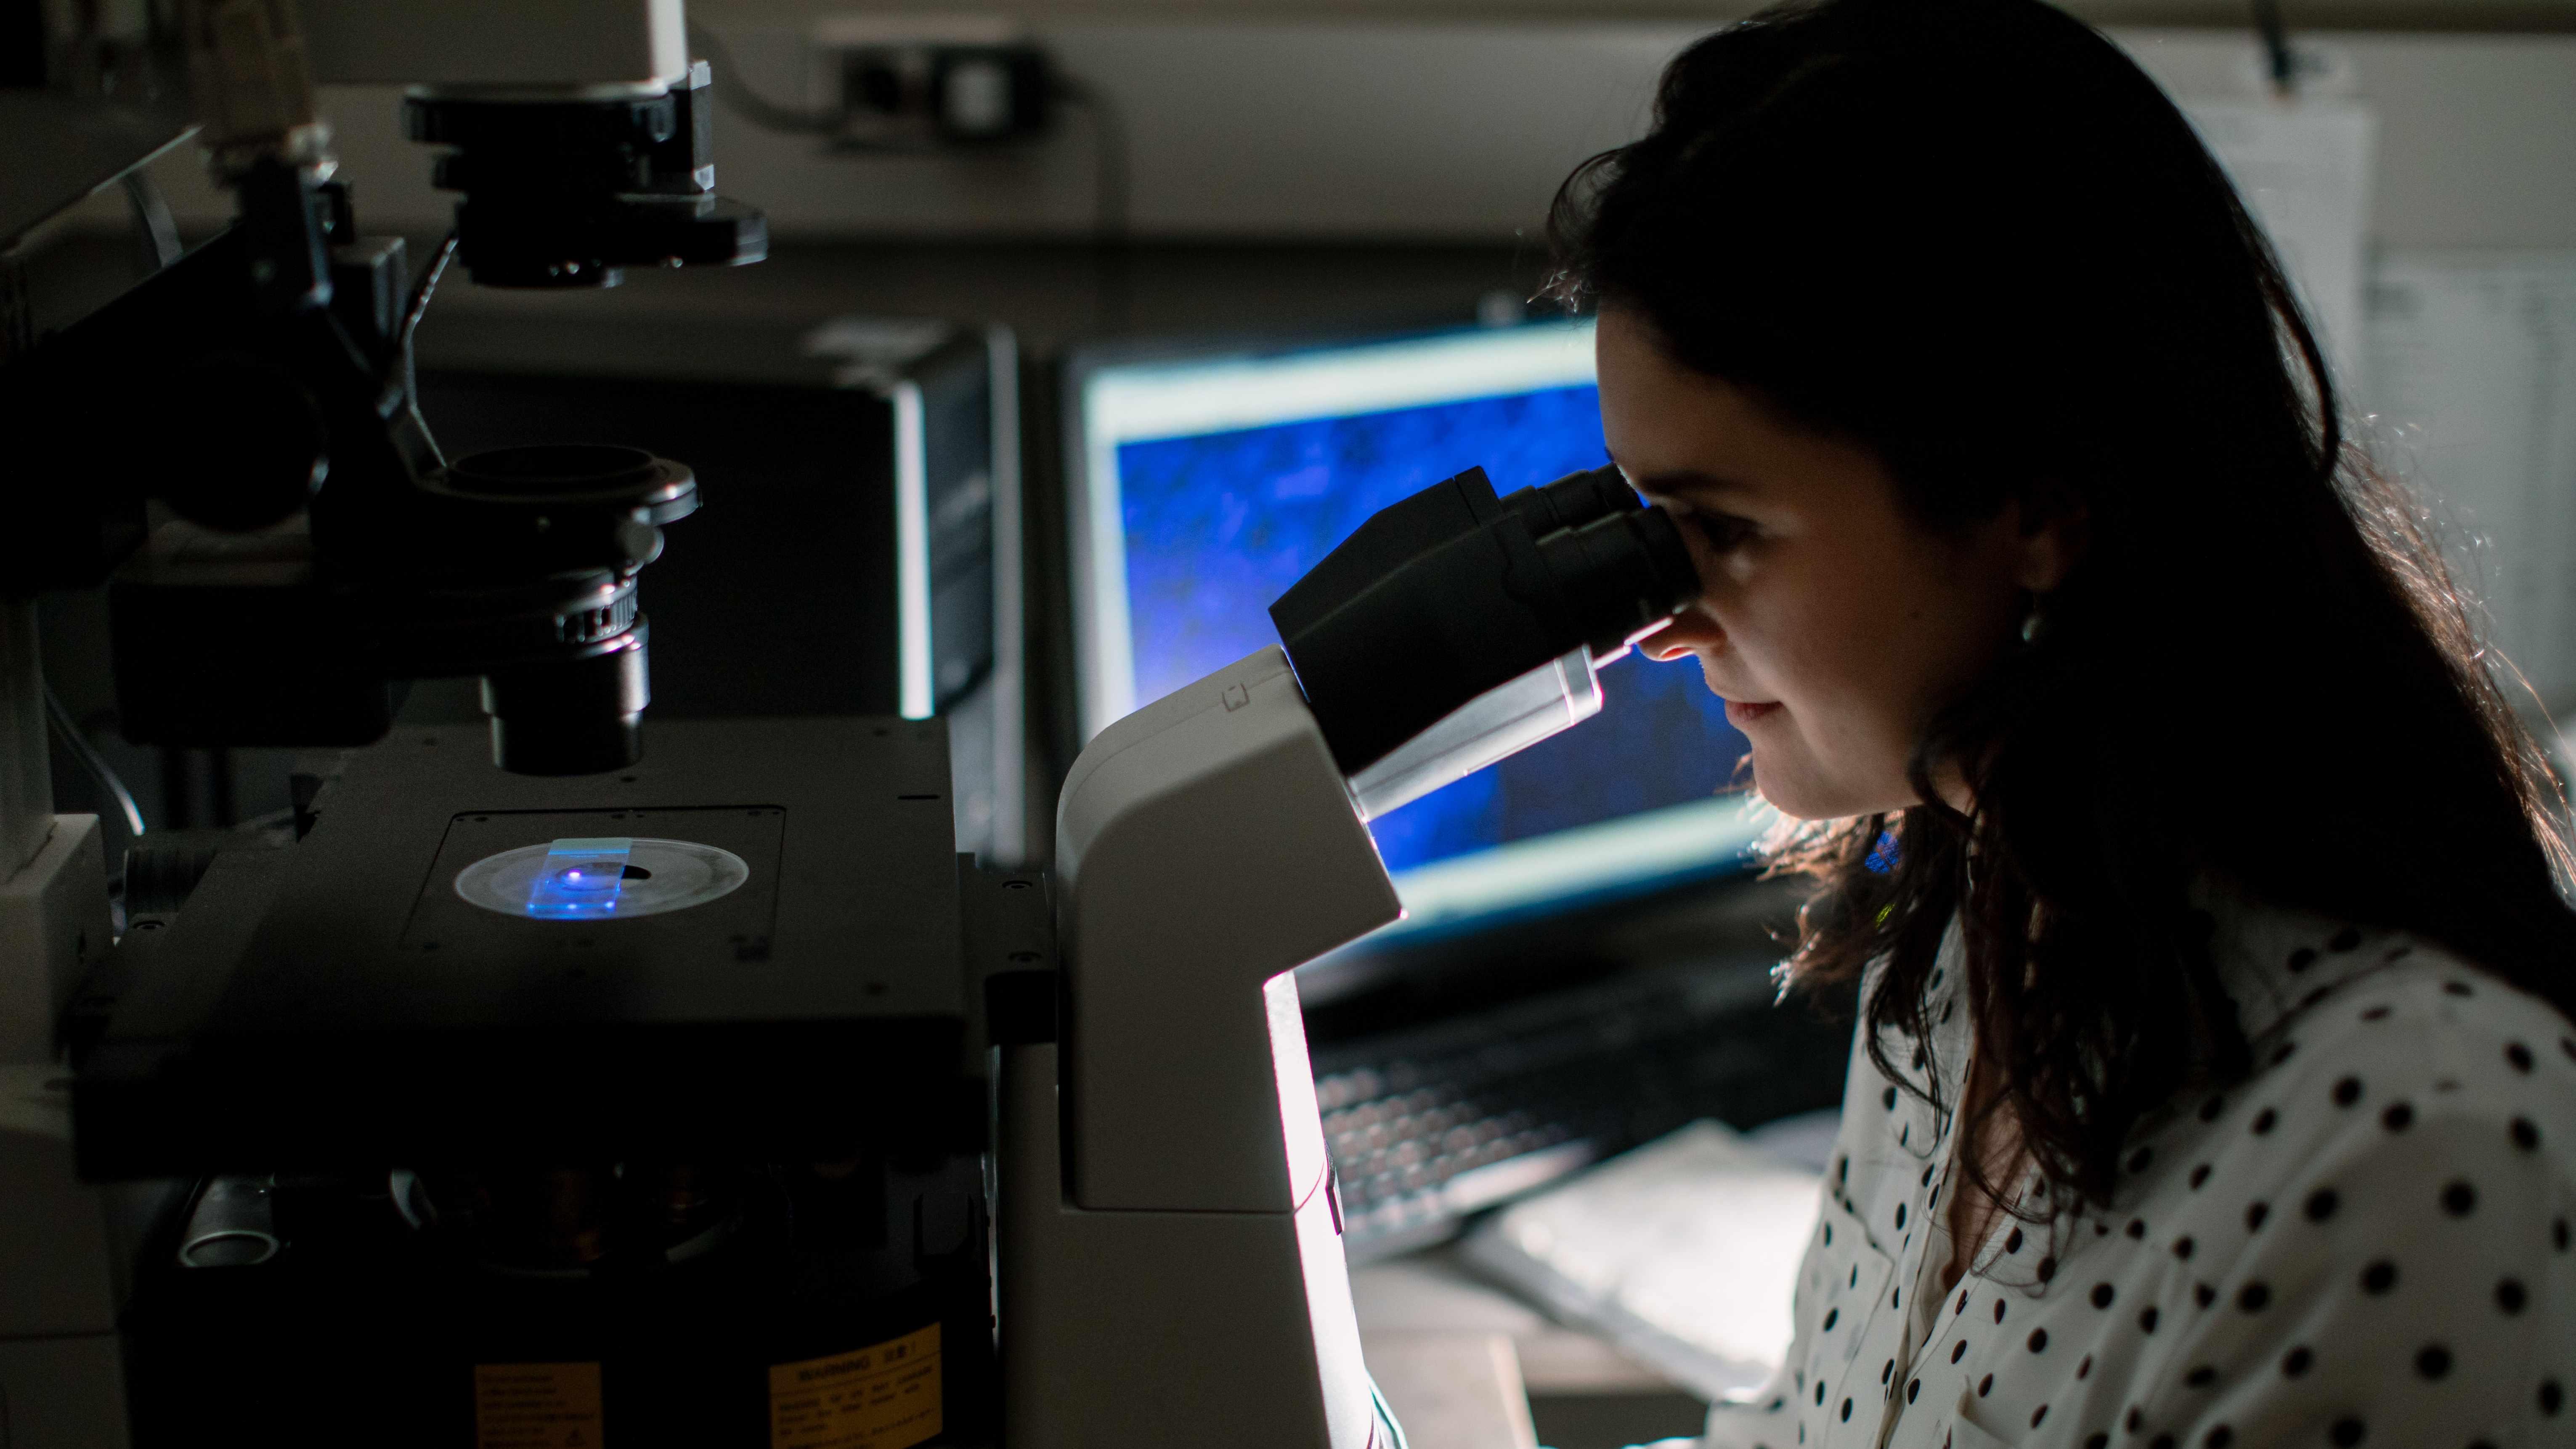 Una investigadora observa una lámina bajo el microscopio.